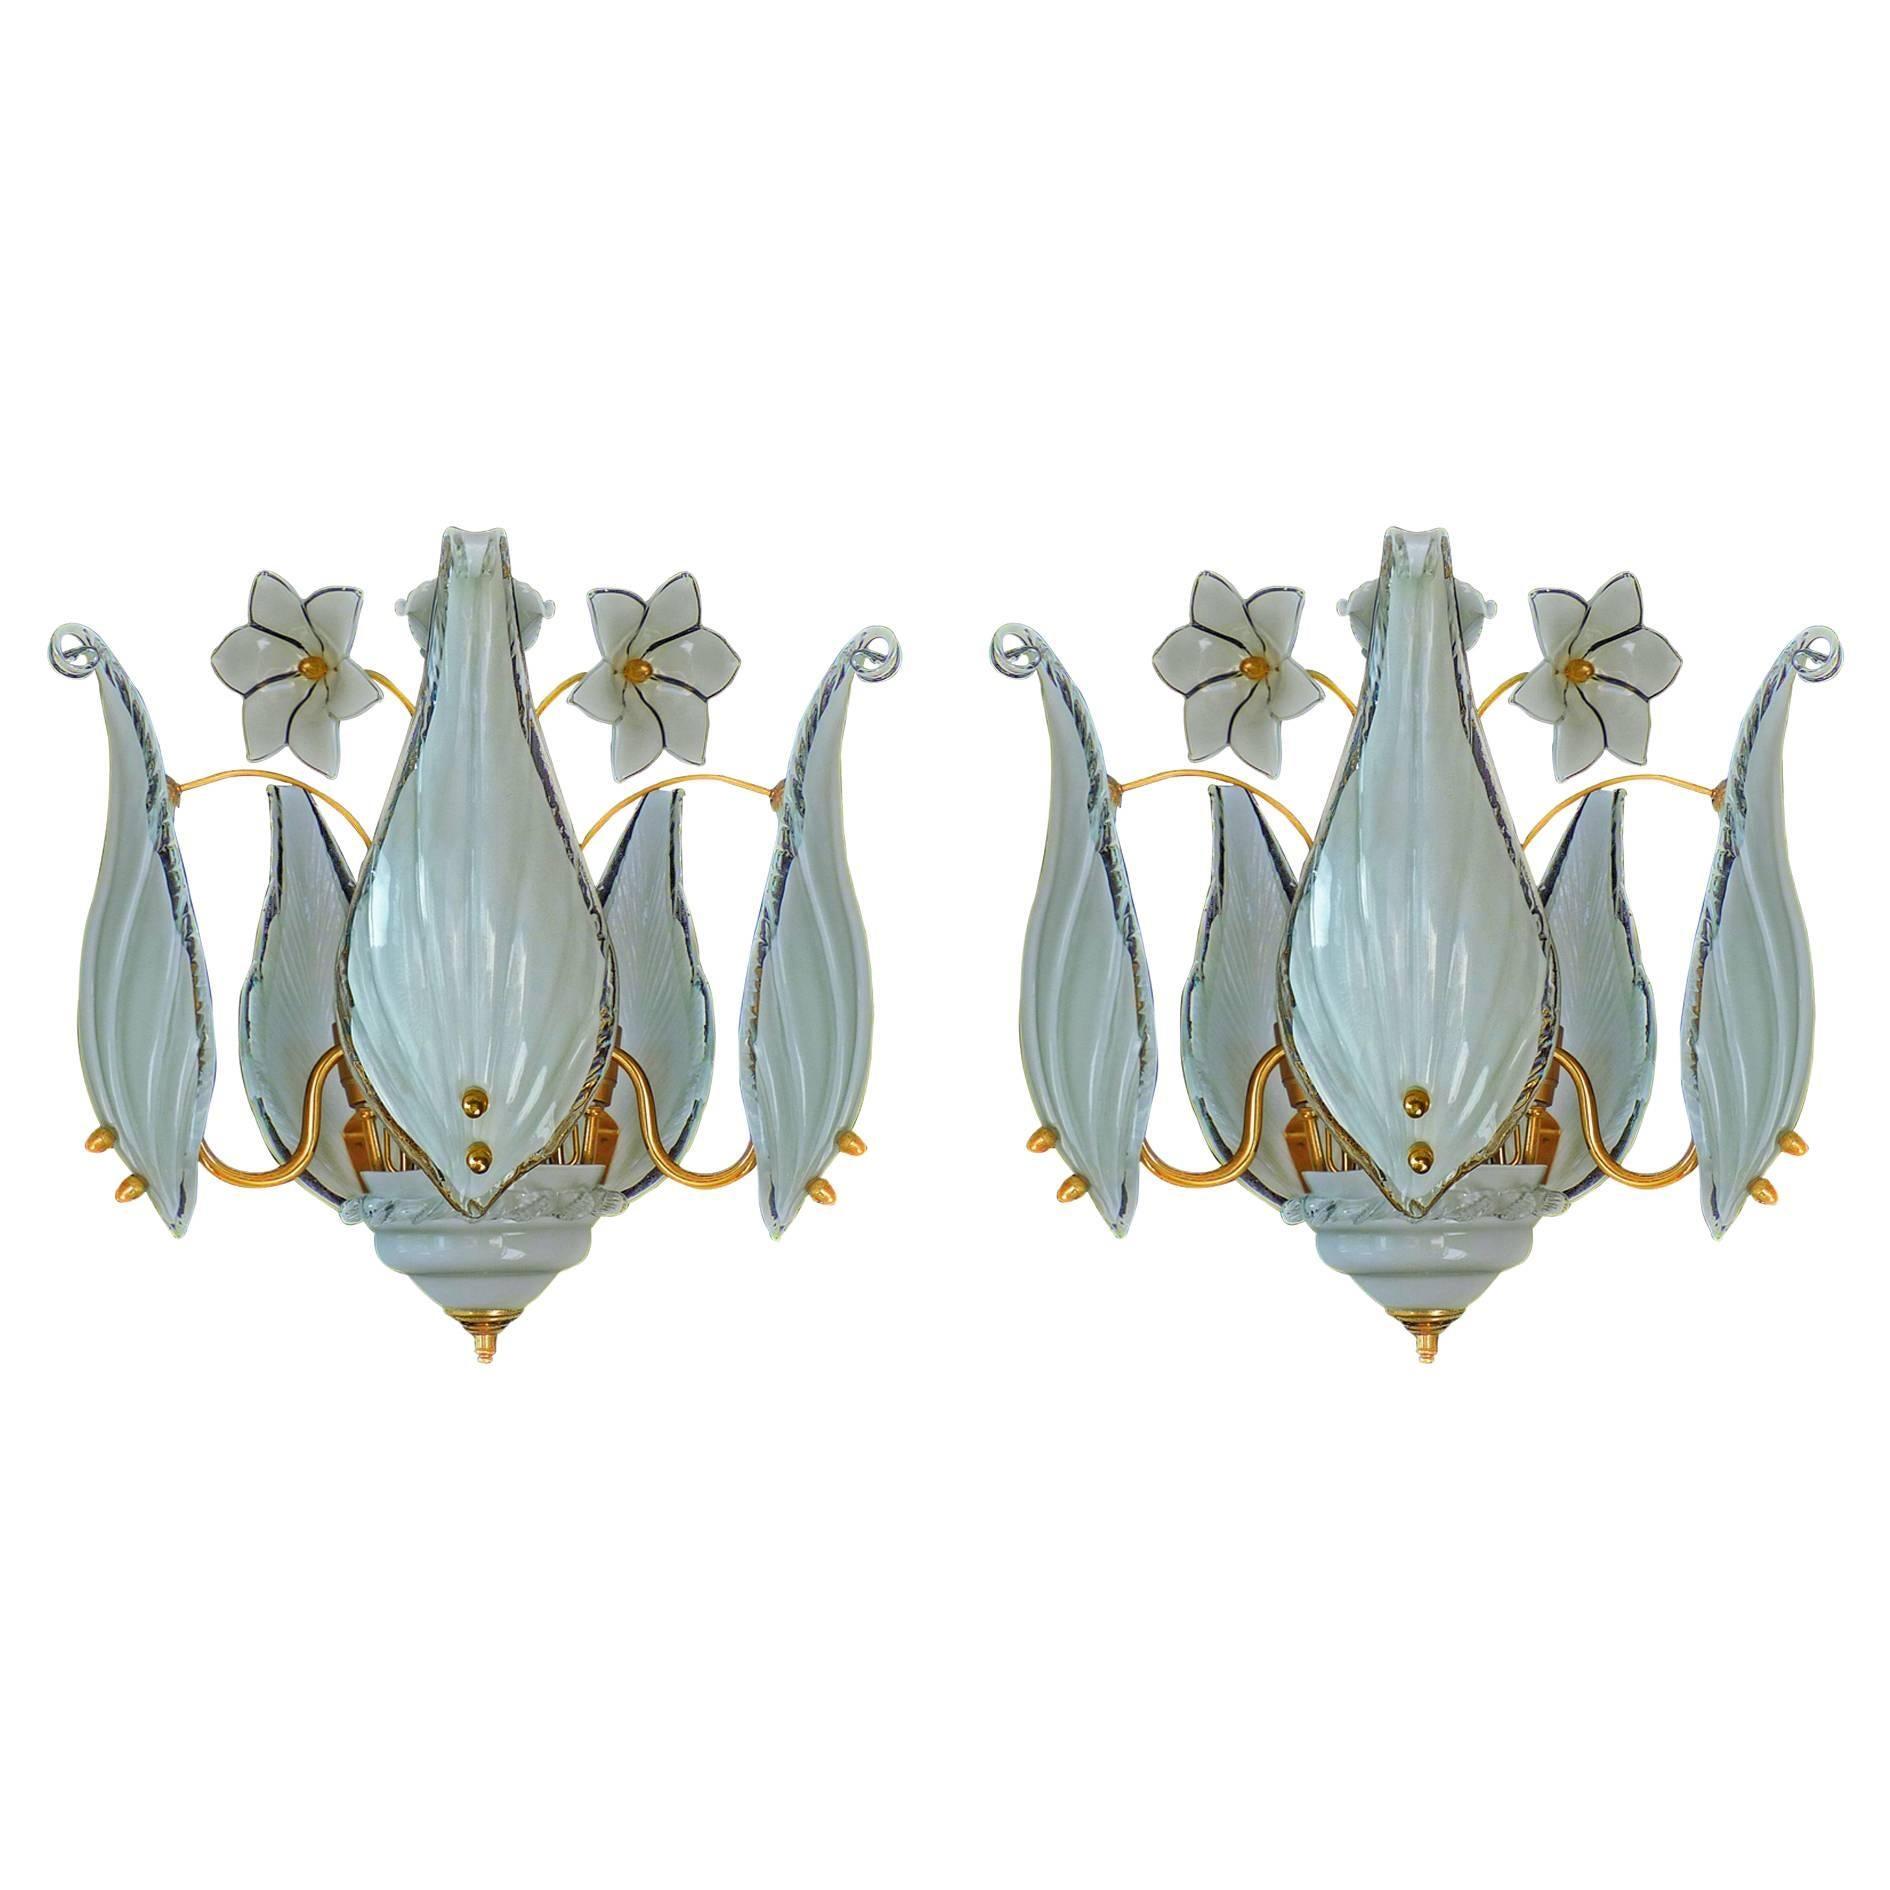 Mid-Century Italian Murano Franco Luce Art Glass and Gilt Brass Chandelier, Pair